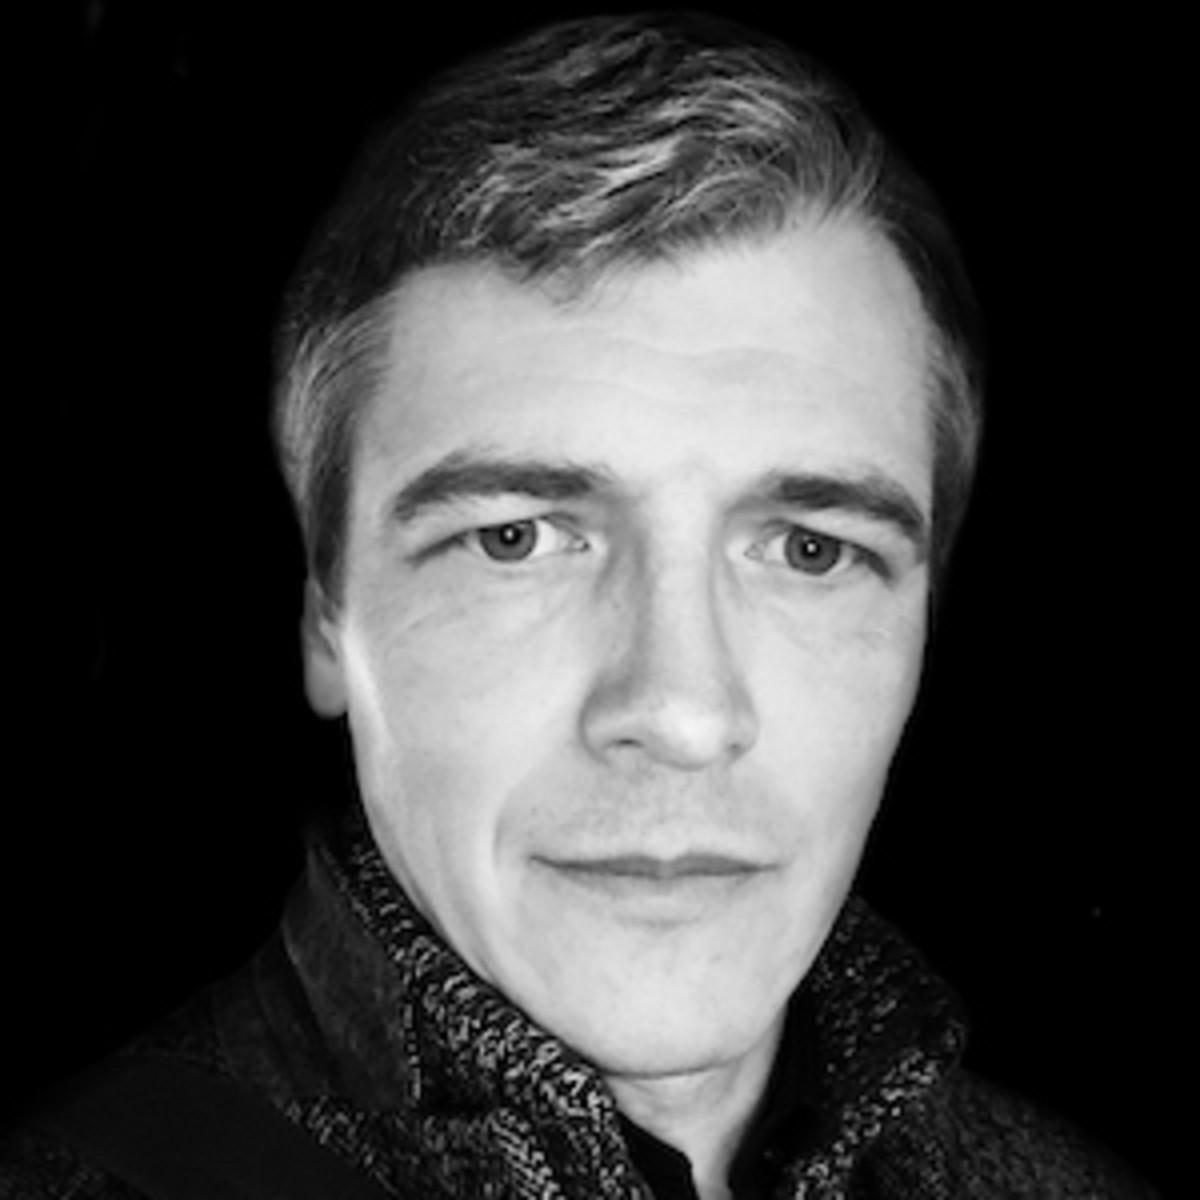 Dimitri Vorontzov